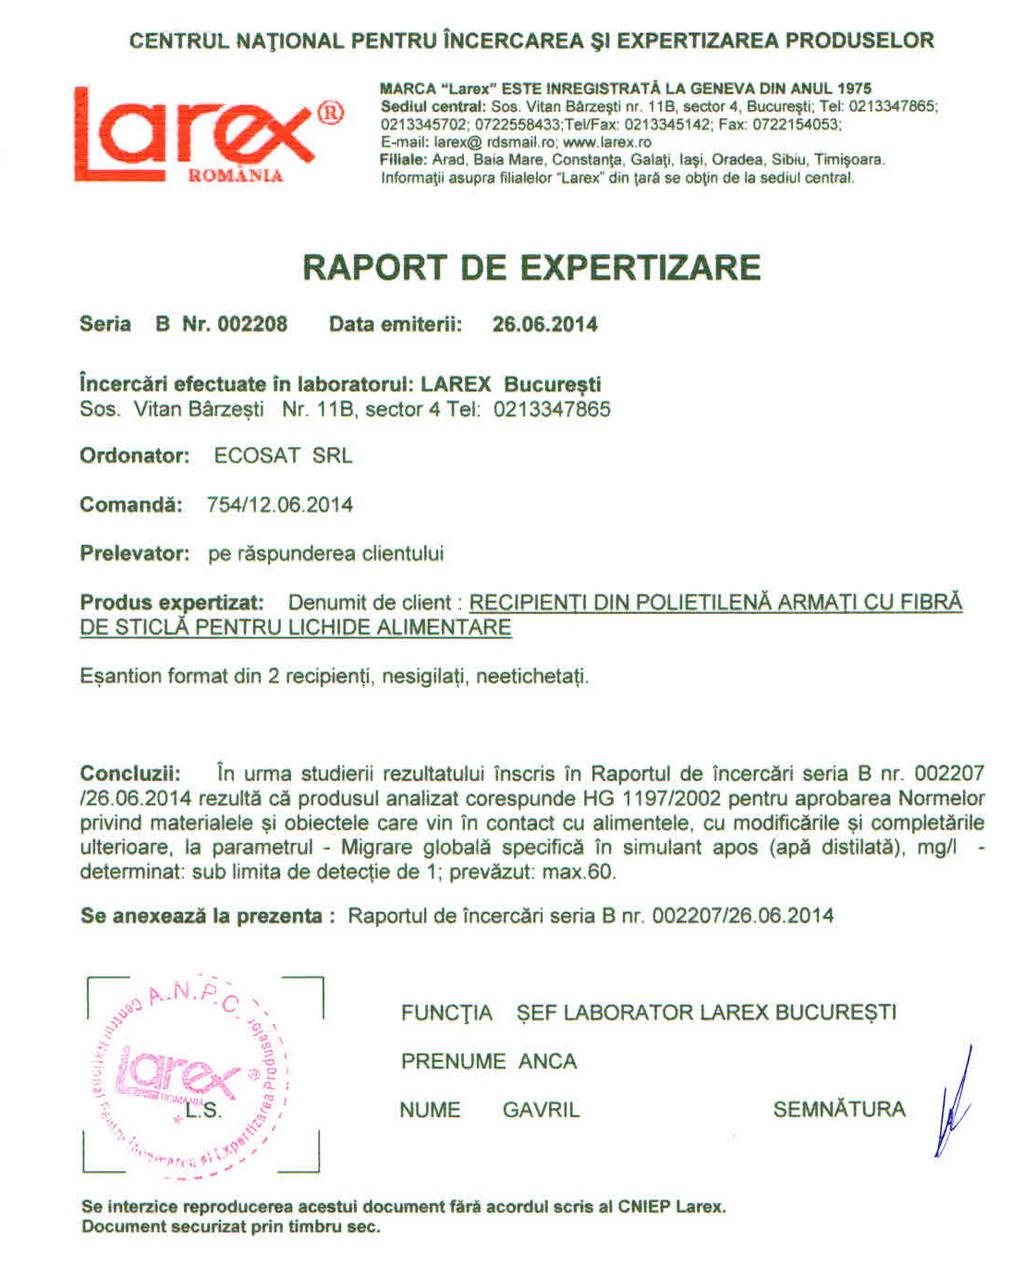 gvpml_03-ecosat-larex-2014-expertizare.jpg